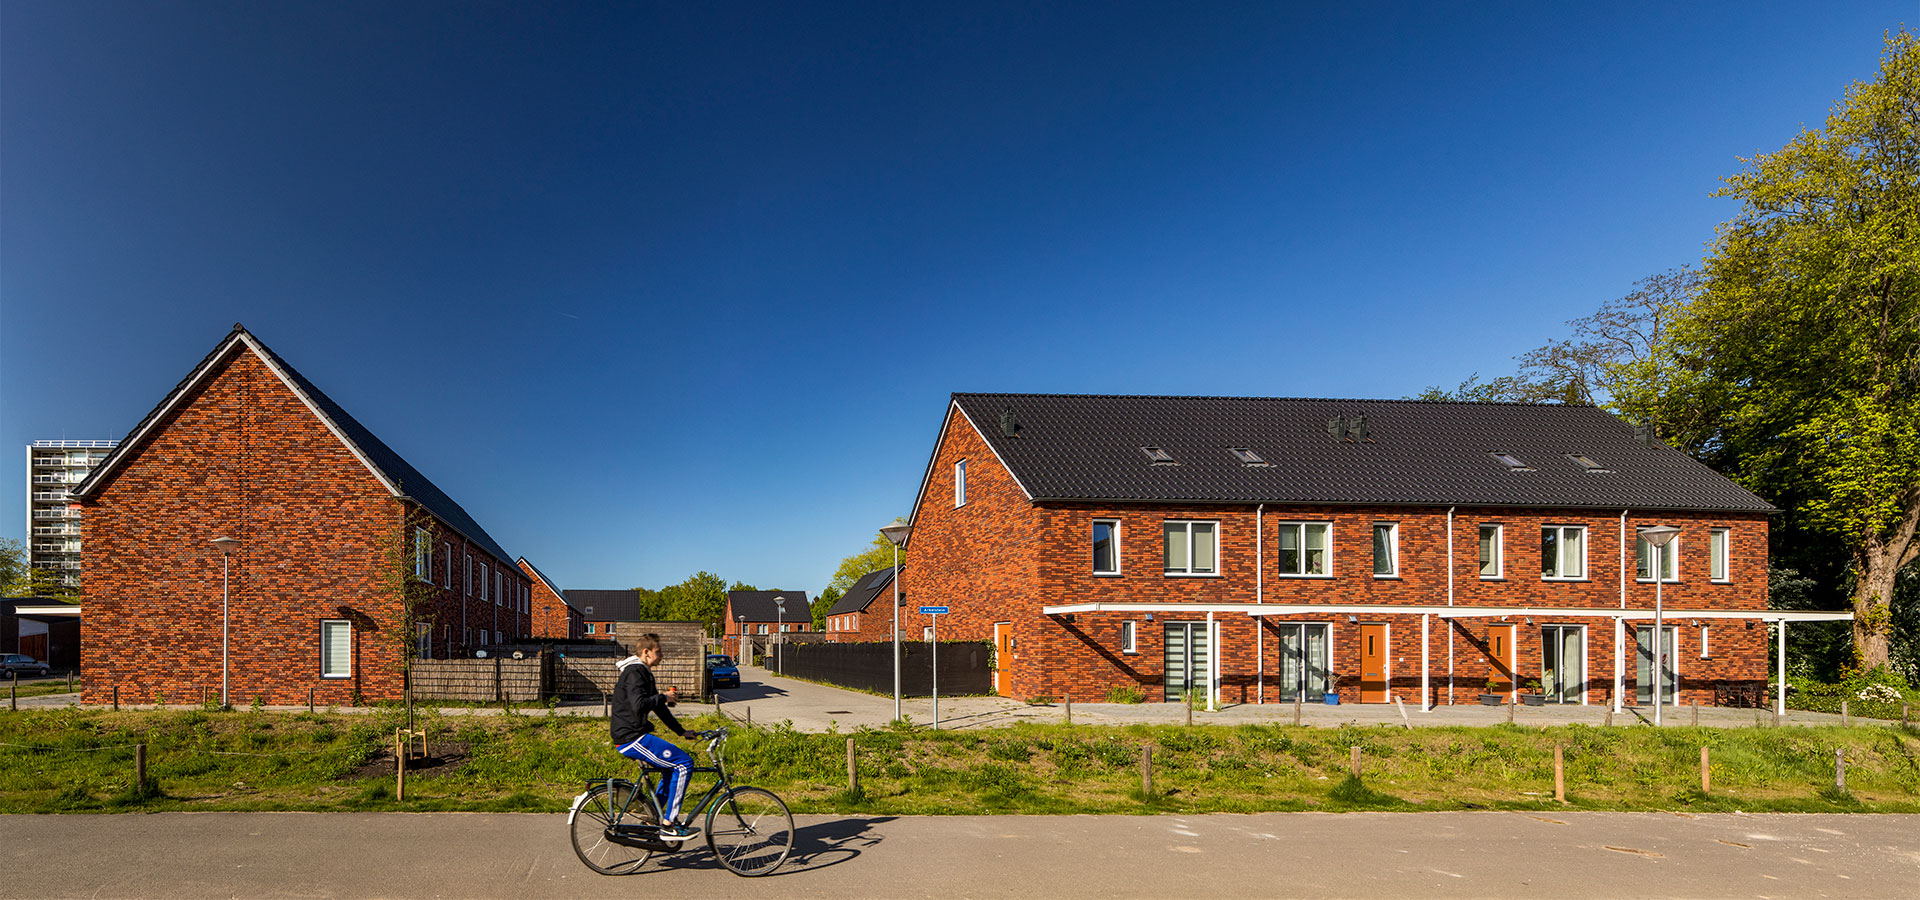 FARO architecten Borgele, Deventer 01